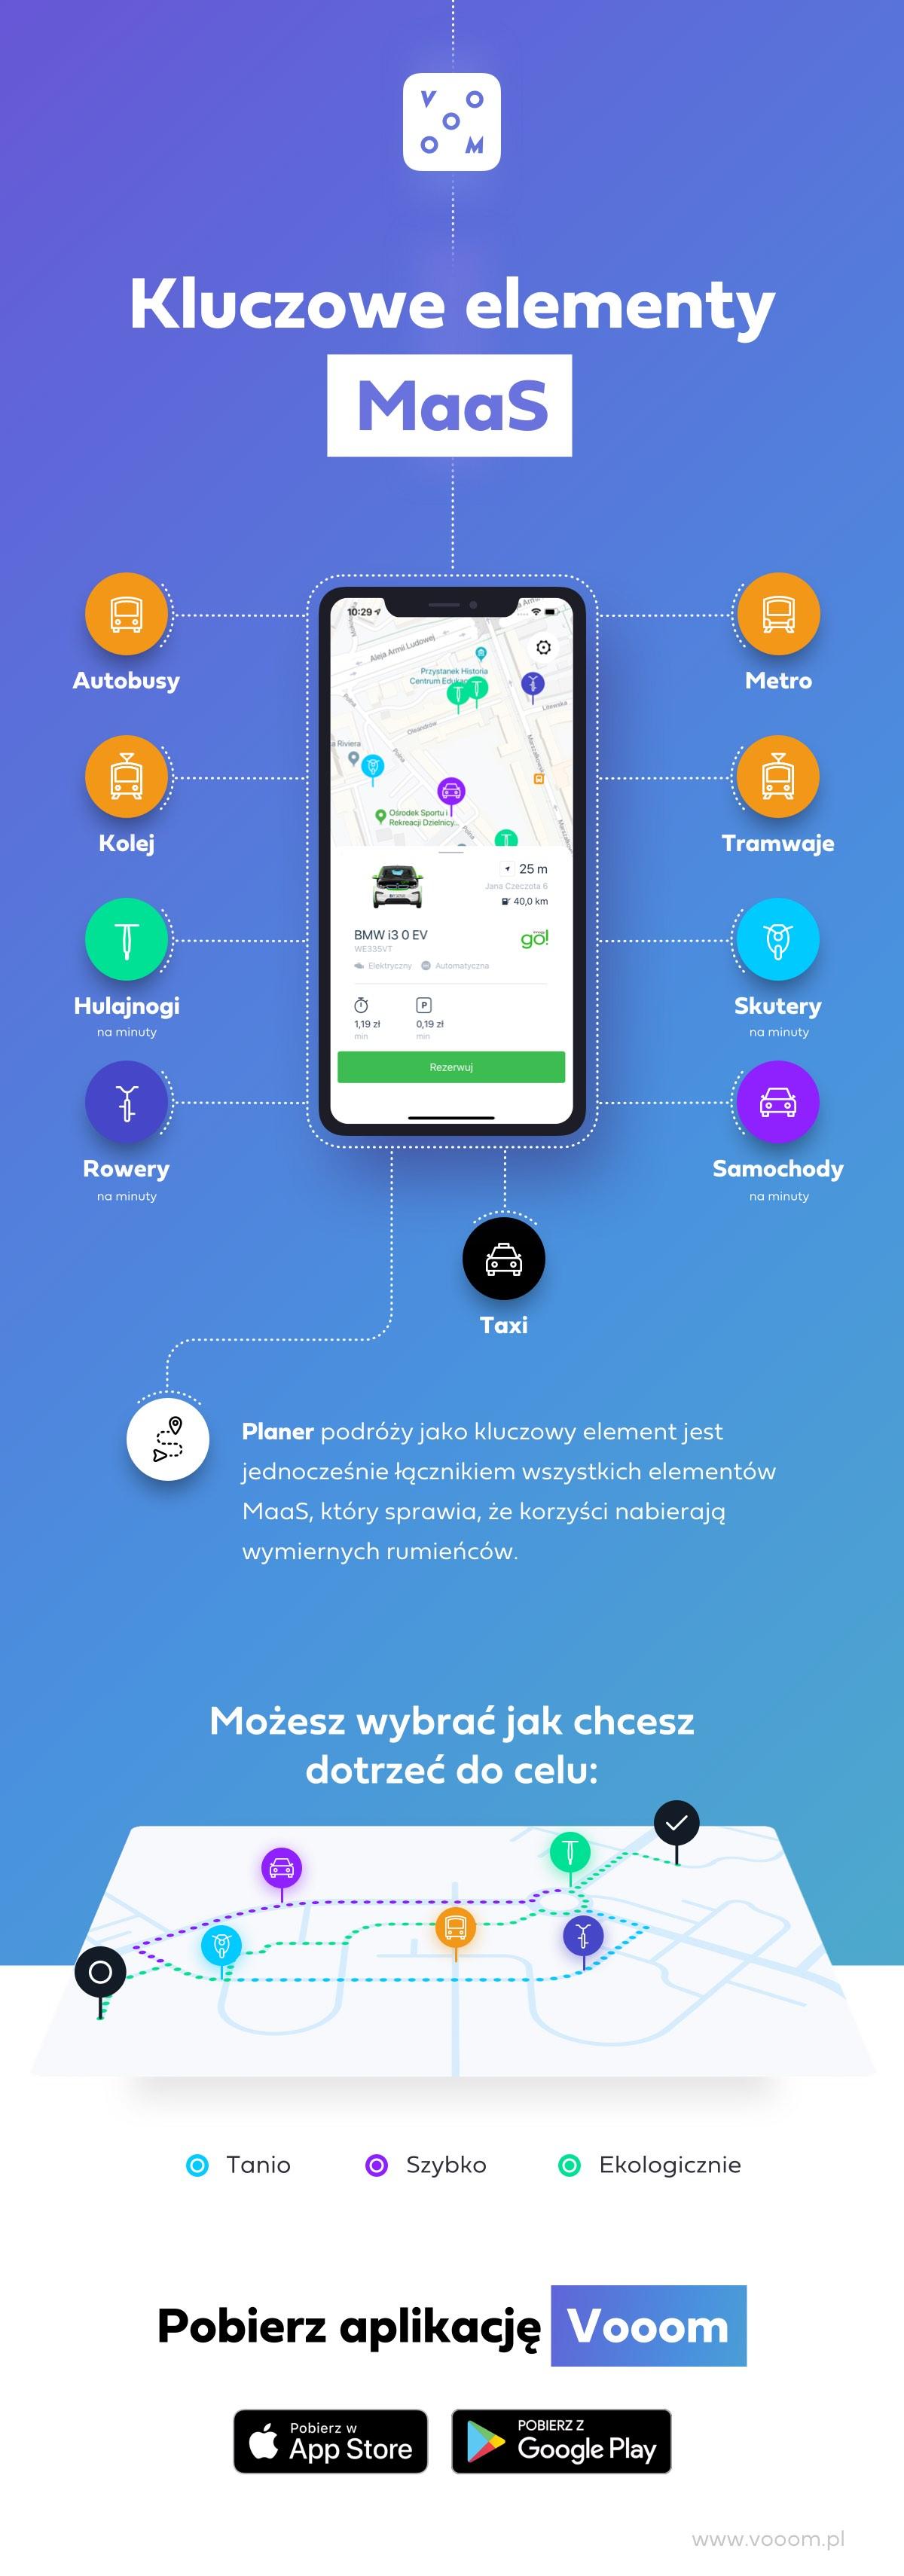 planer vooom infografika cz 3